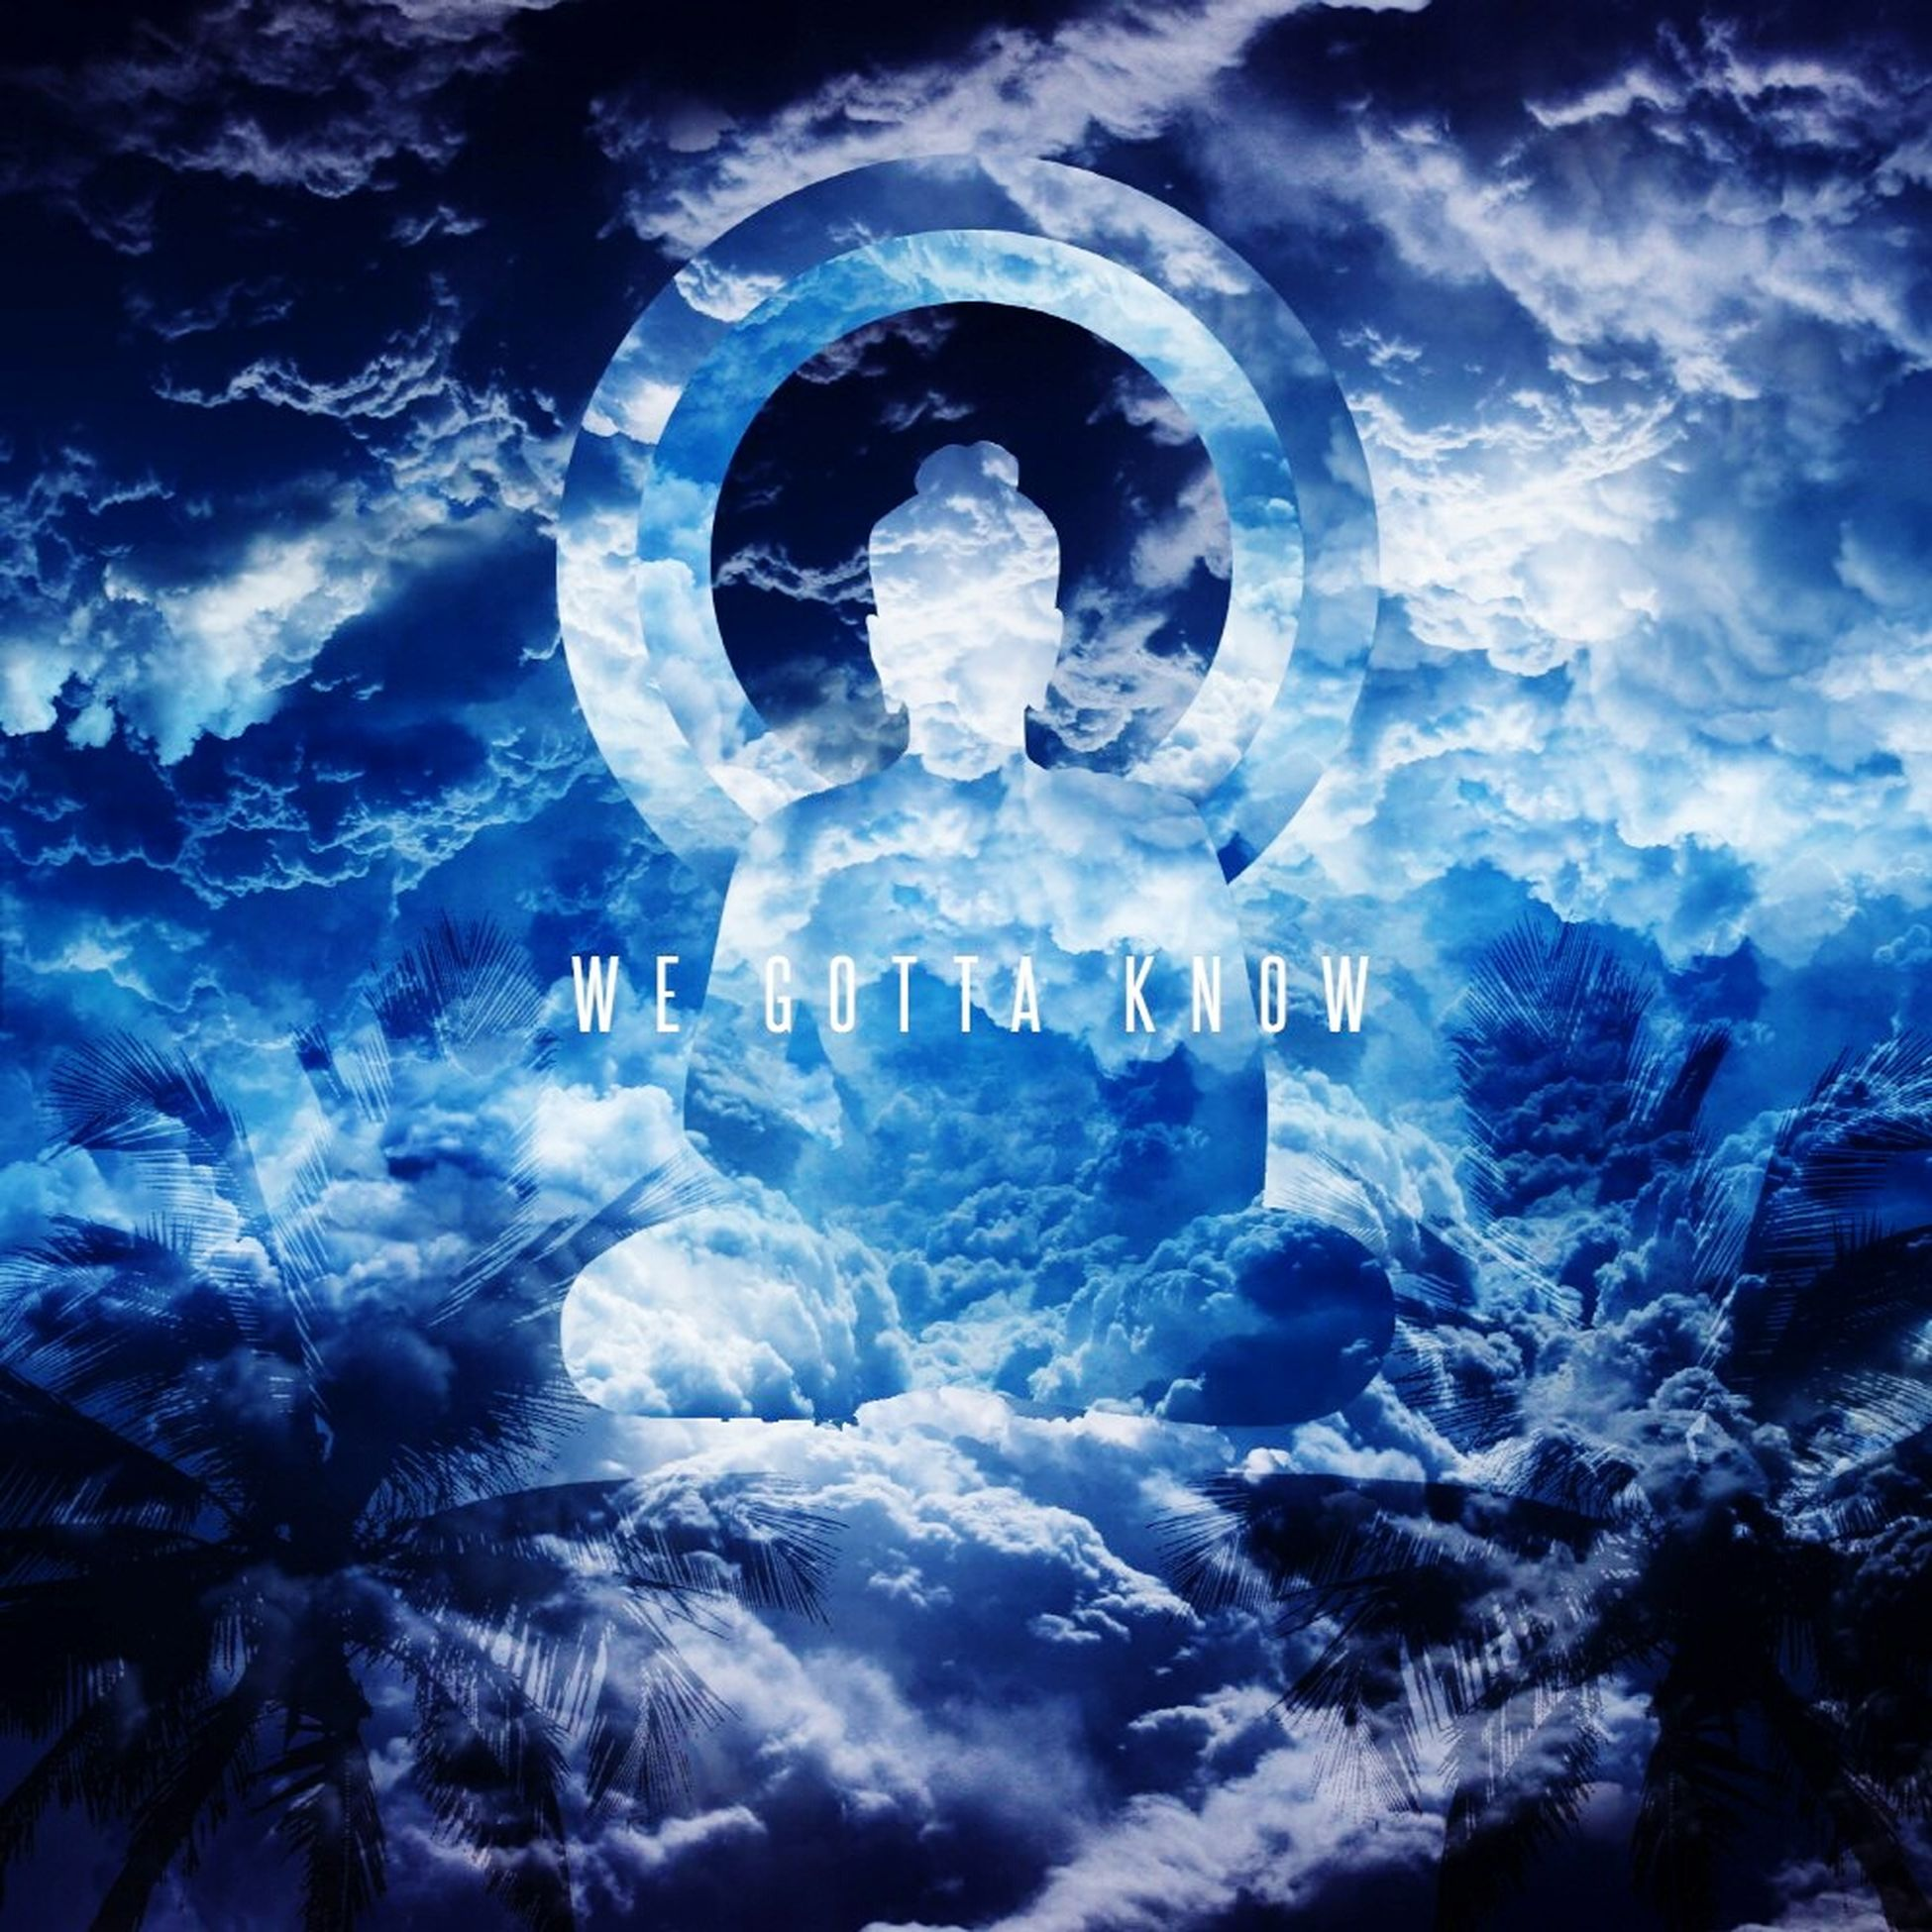 1llionaire Music Dok2 Beautiful